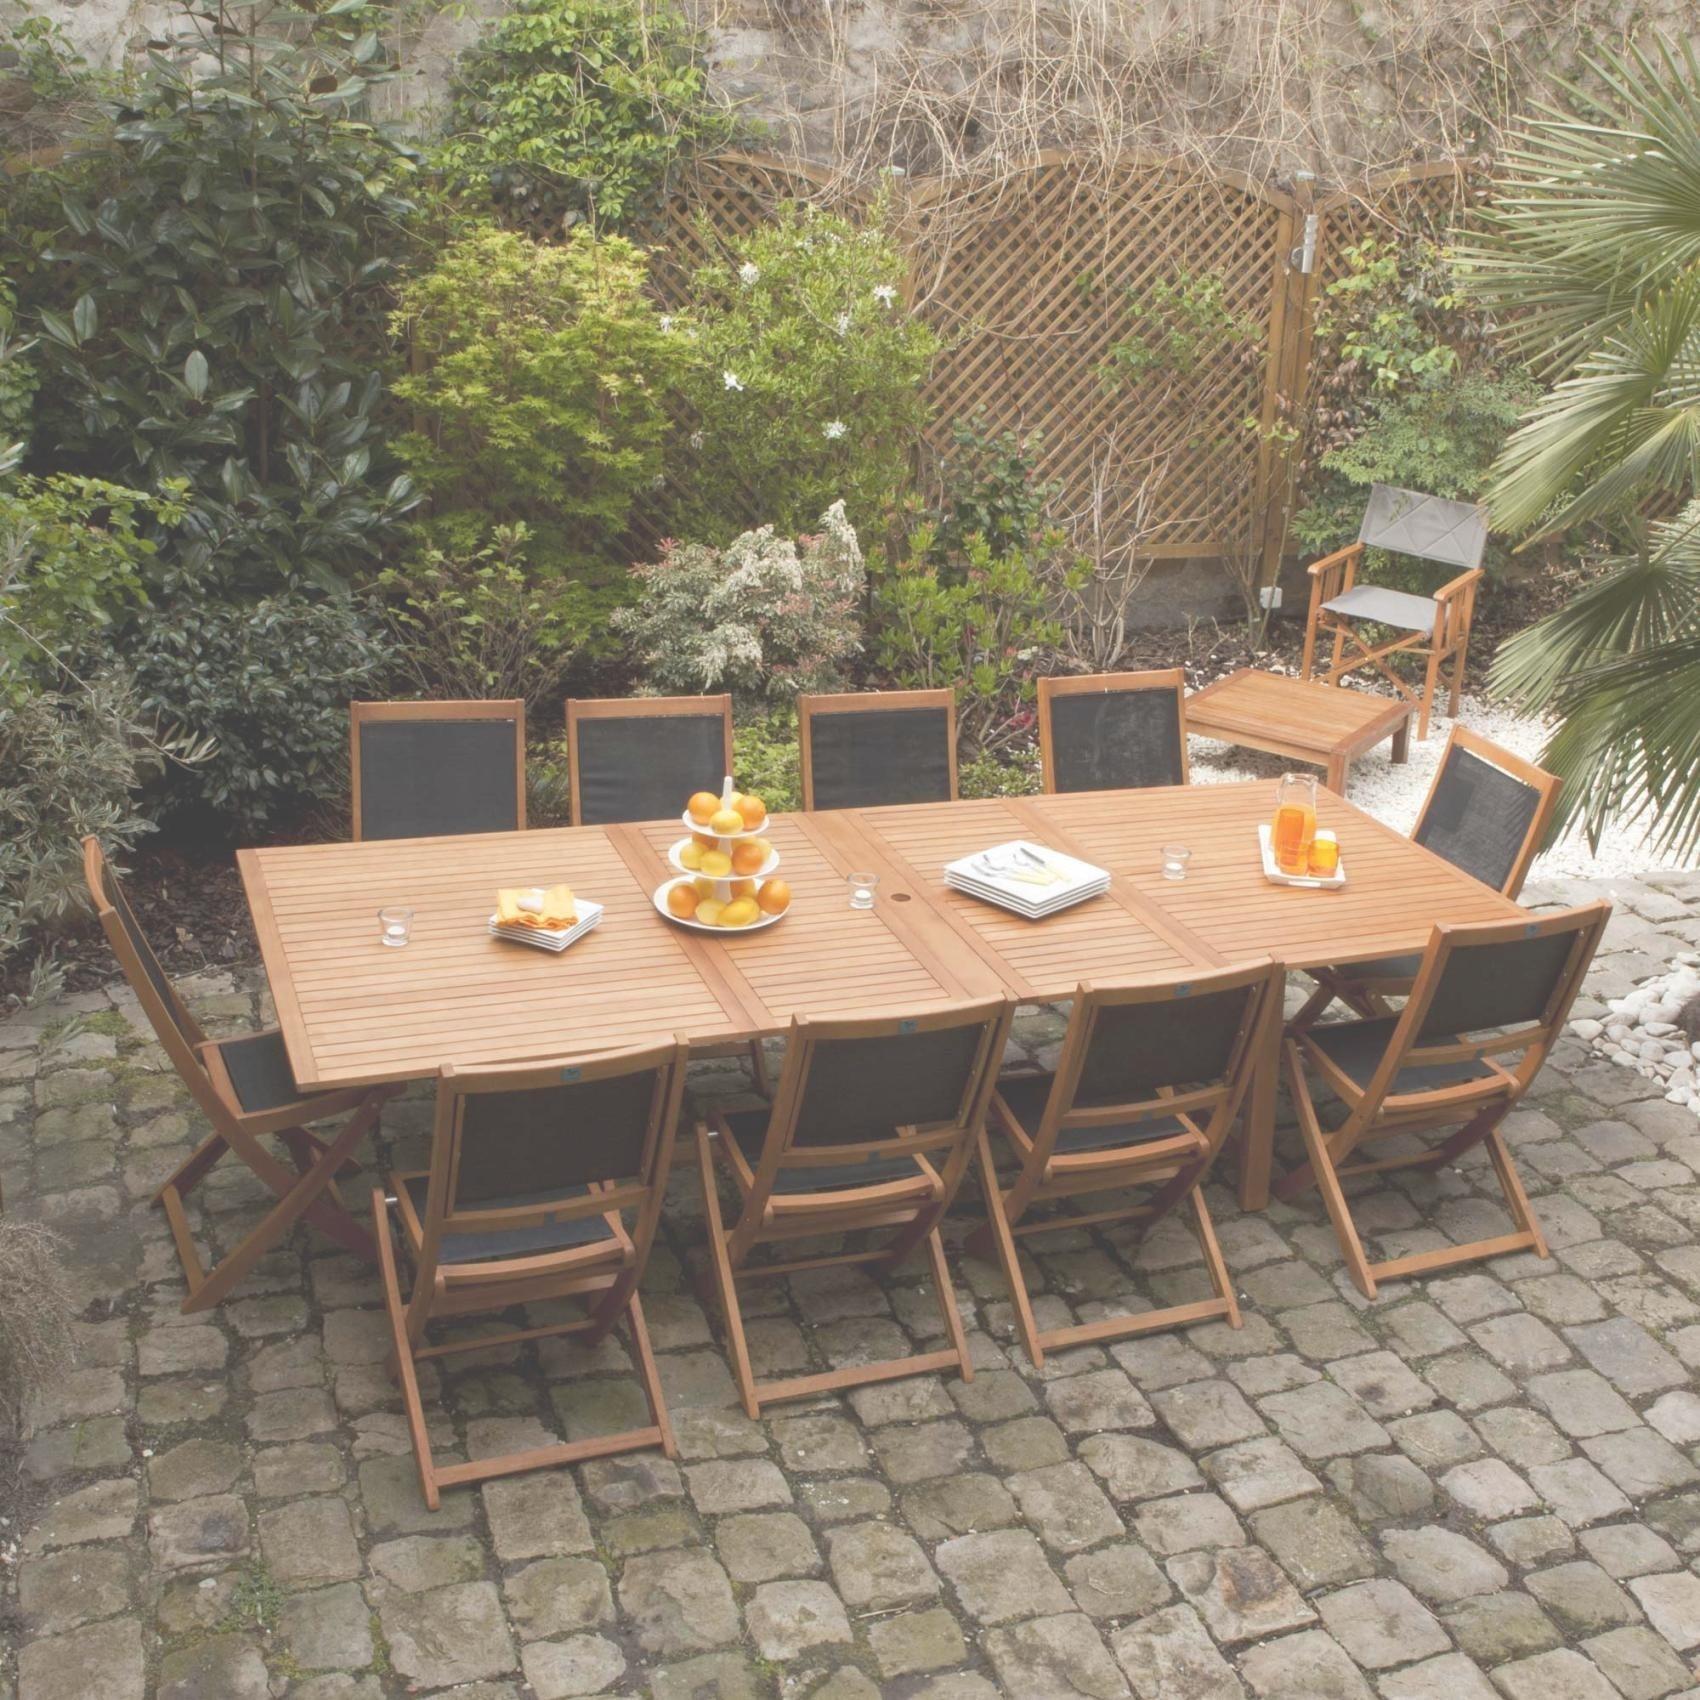 Armoire Plastique Weldom | Bright Shadow Online intérieur Abri De Jardin Weldom